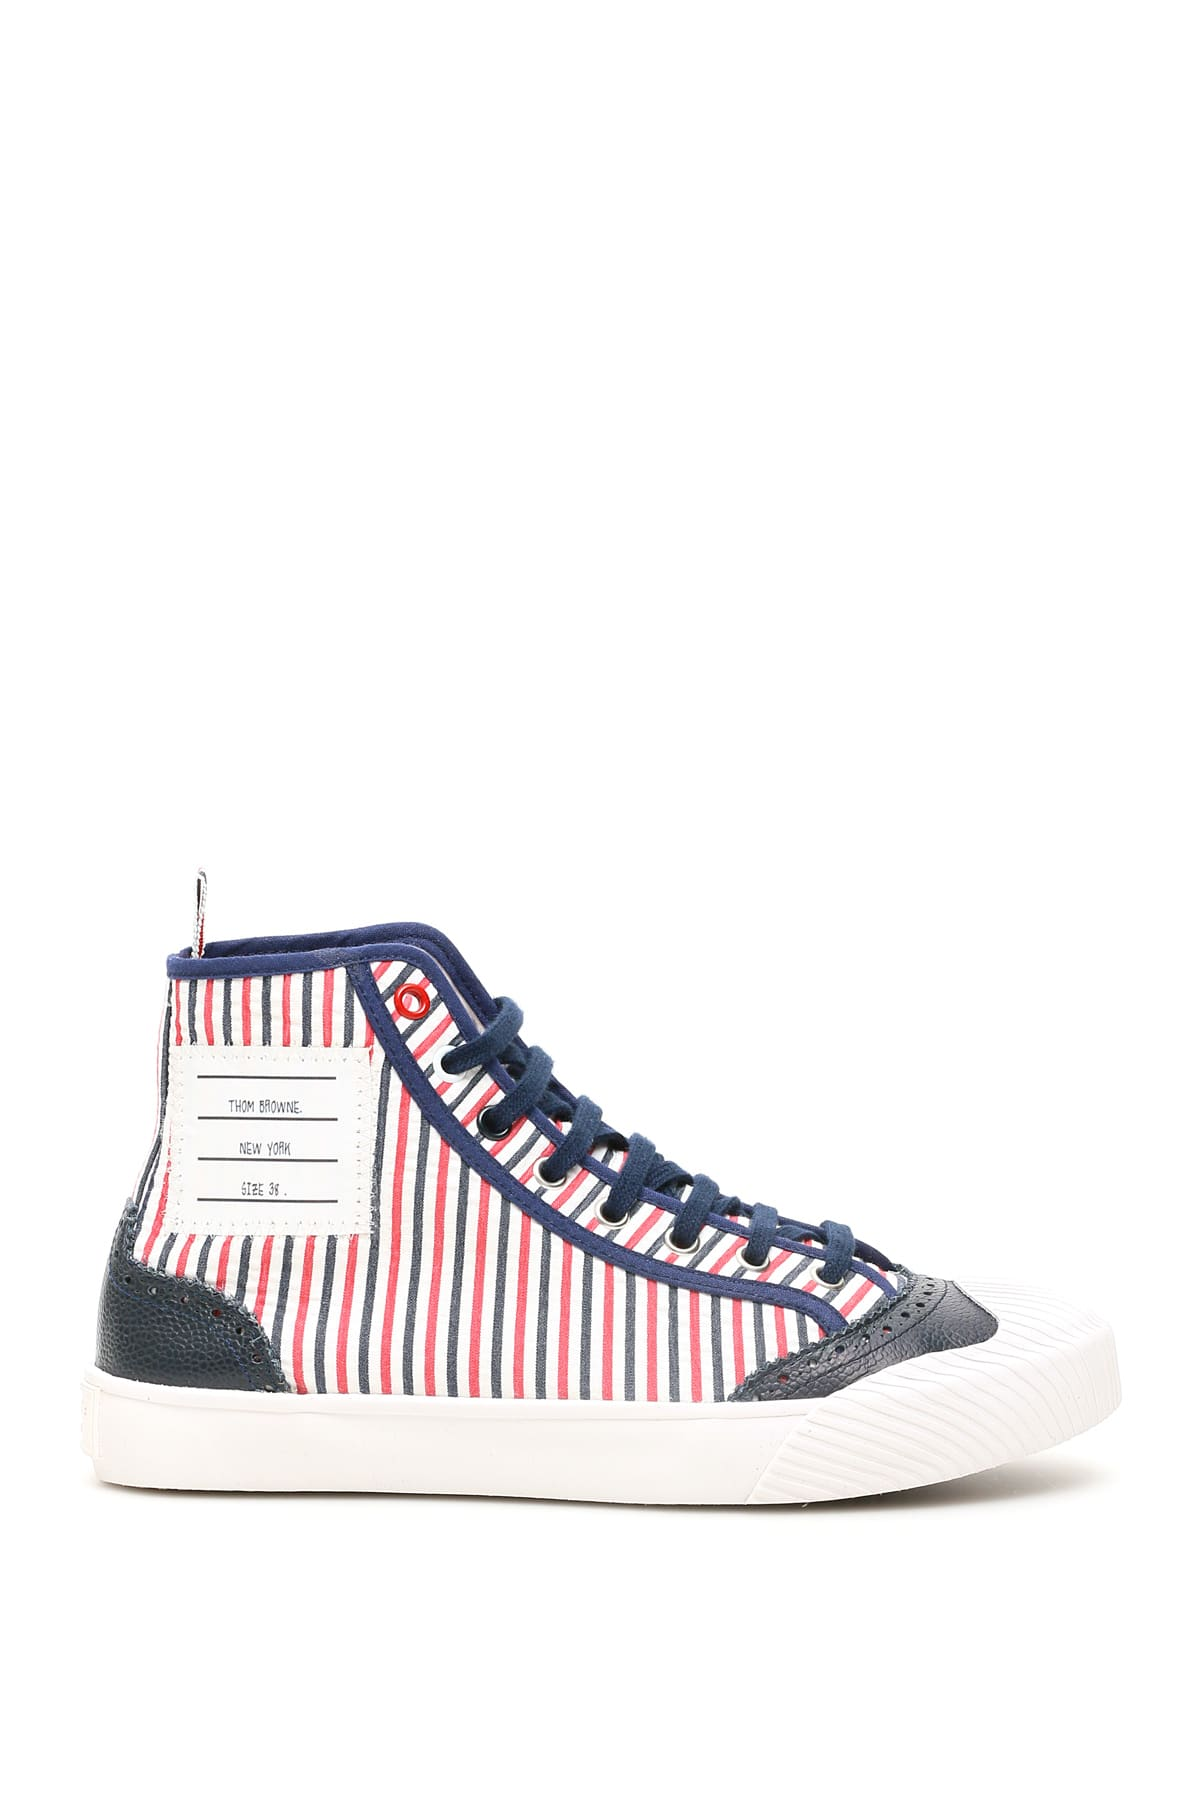 Thom Browne Hi-top Trainer Sneakers